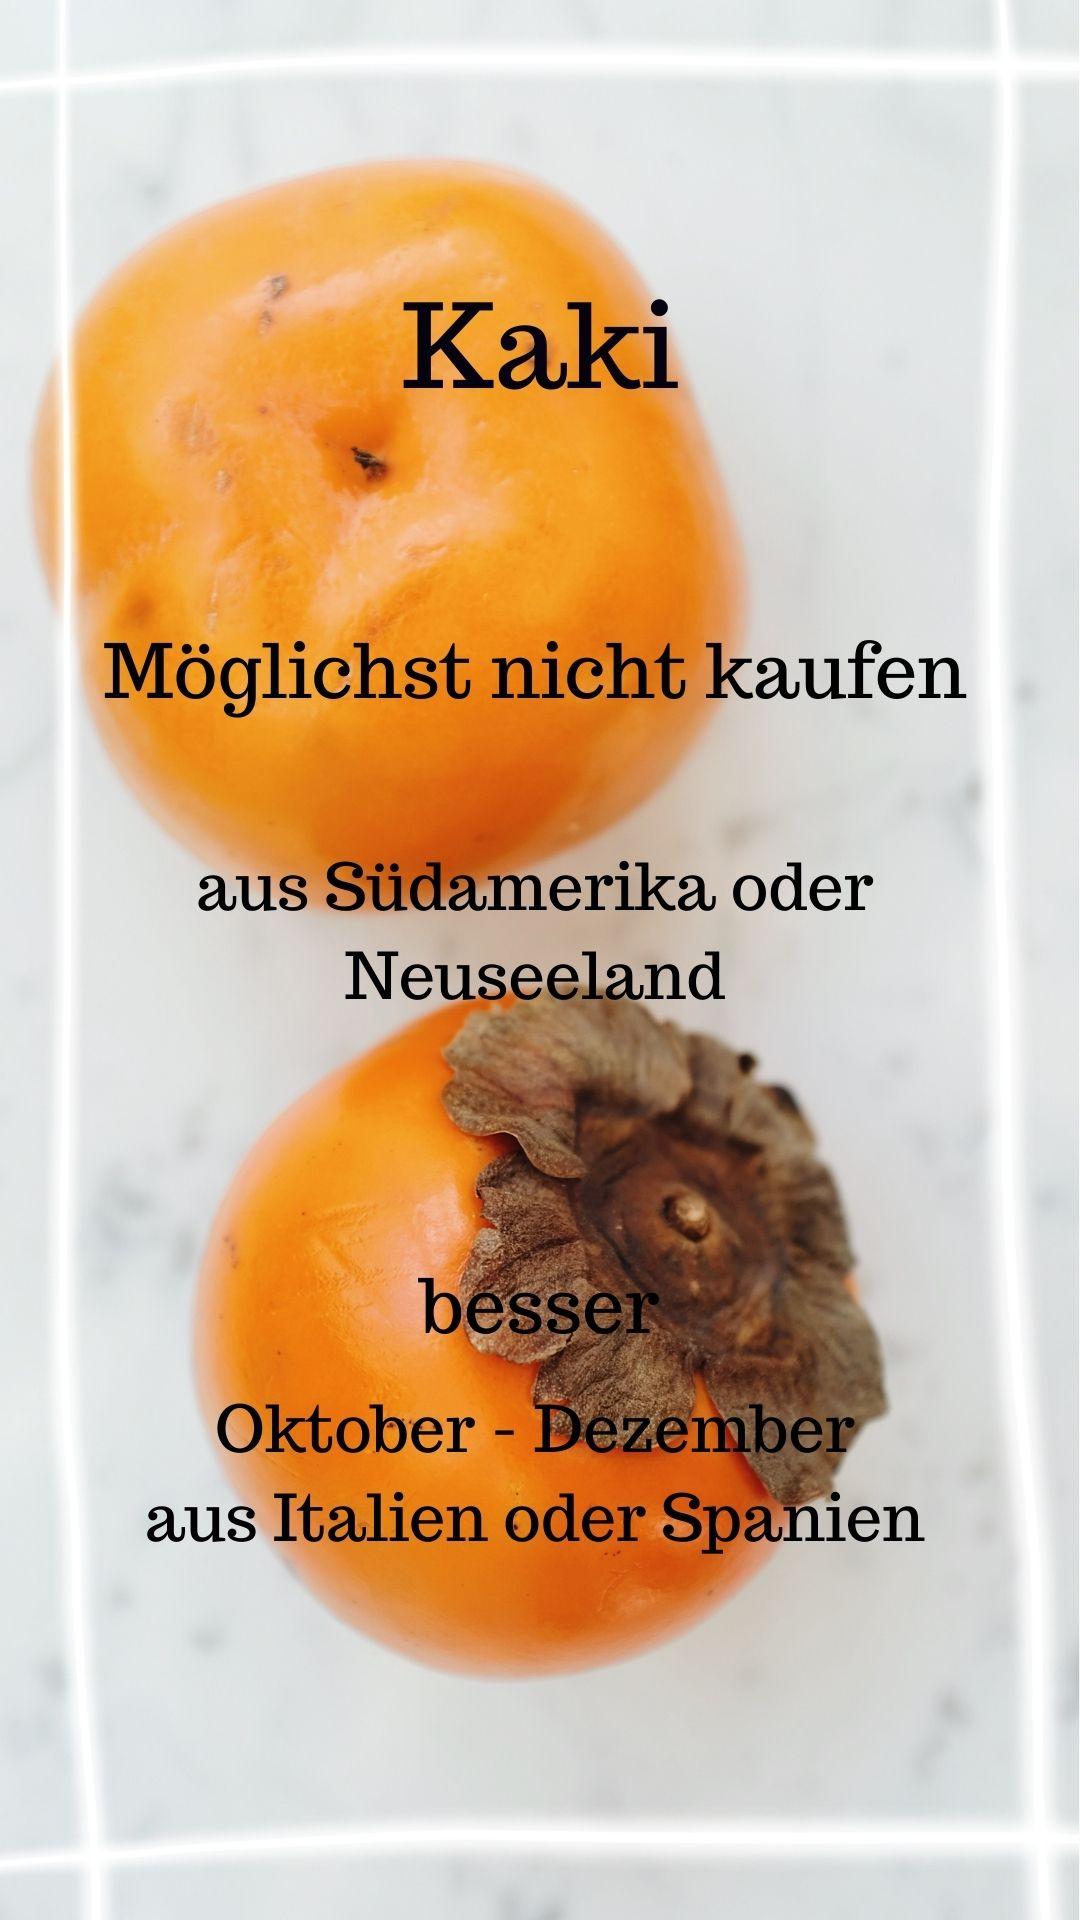 Saison Kaki Oktober - Dezember